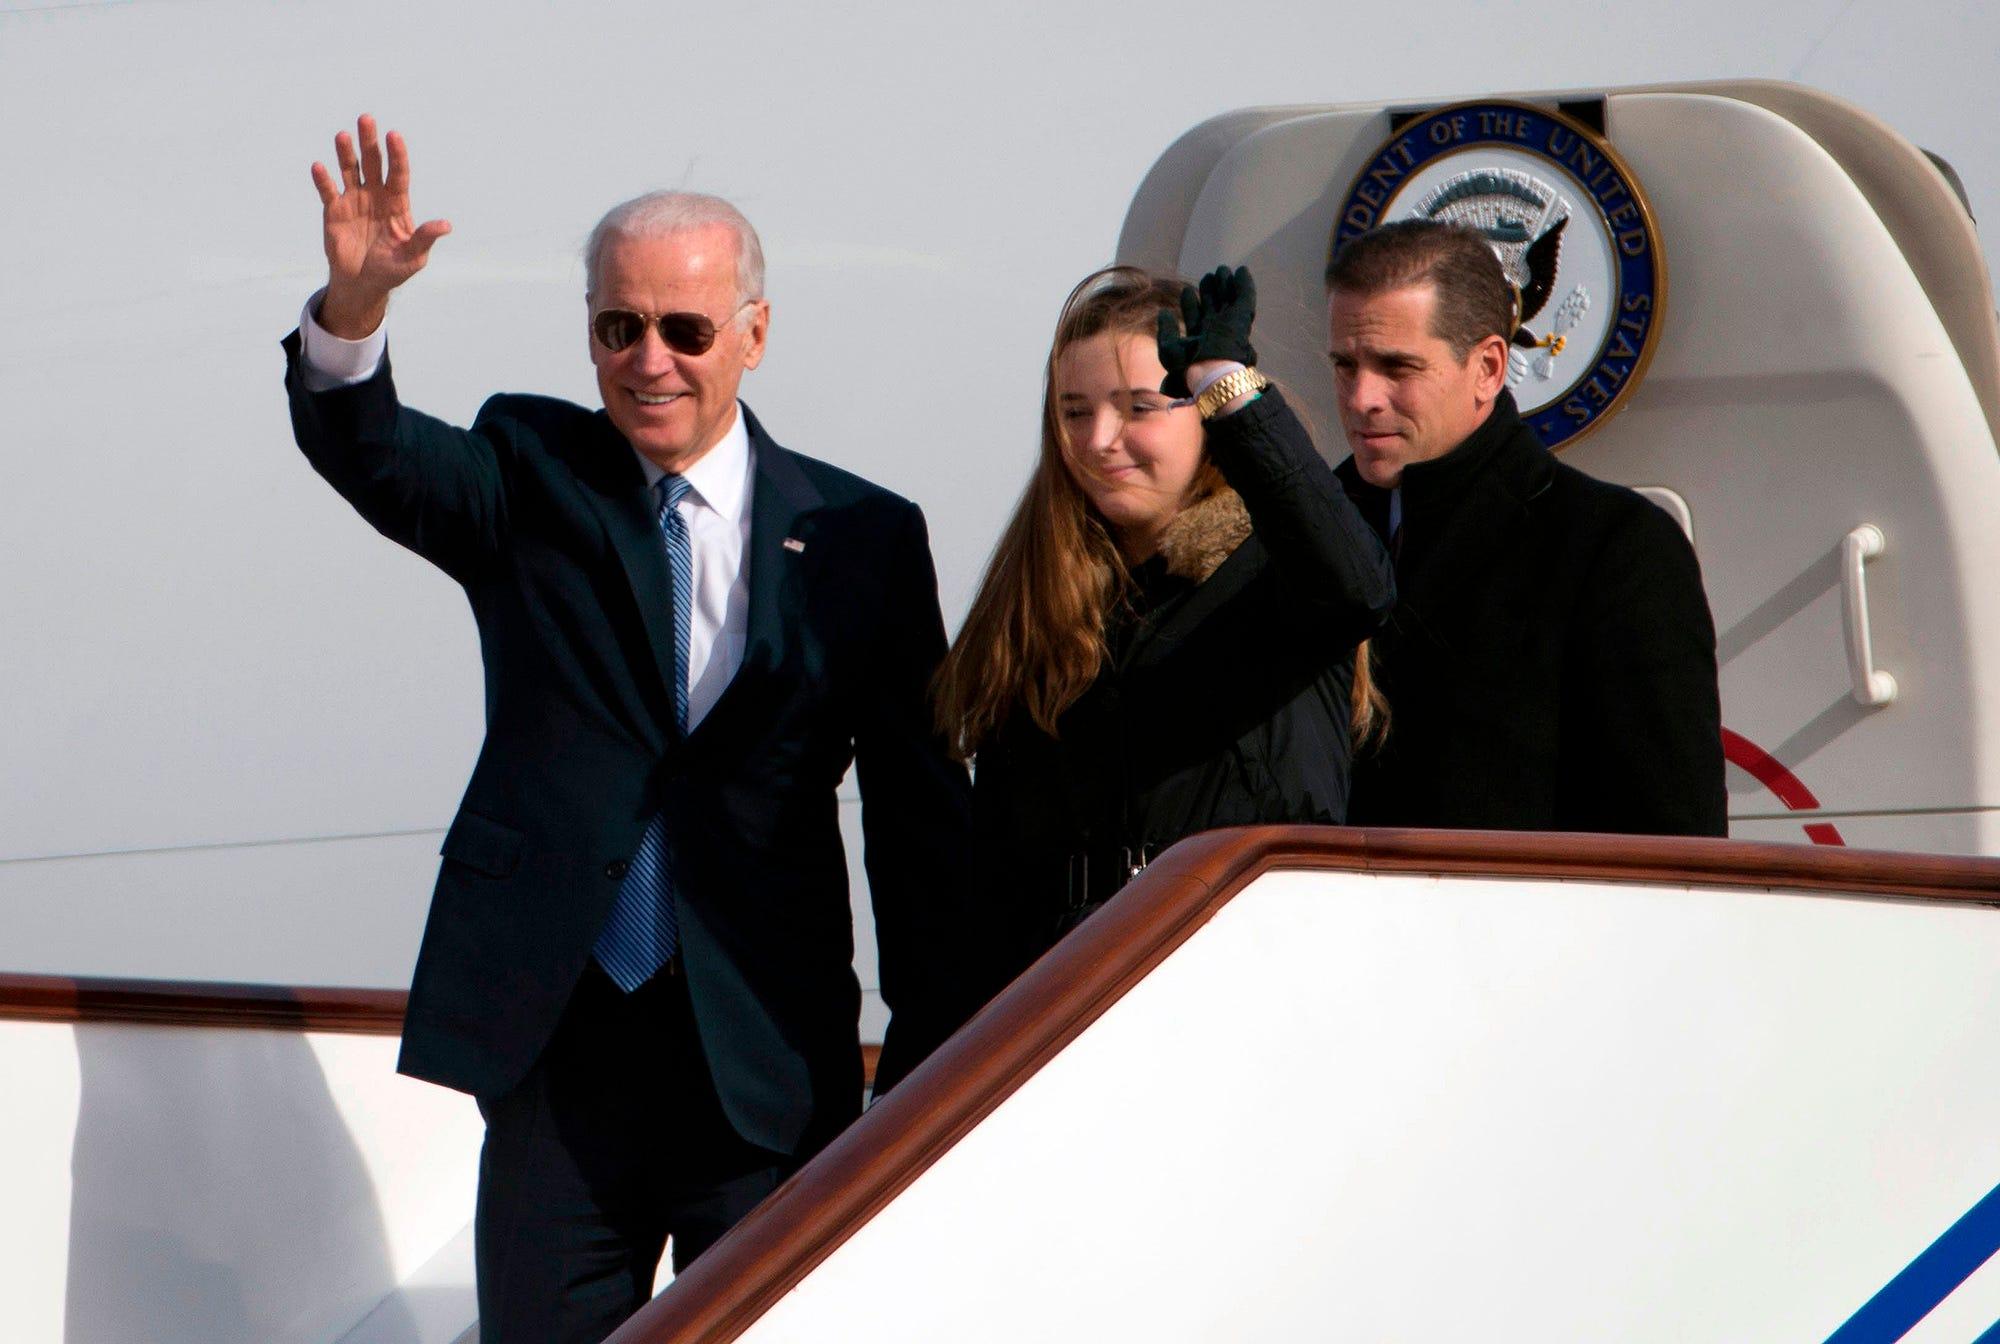 Hunter Biden Who Is Joe Biden S Son Mentioned In Ukraine Trump Call